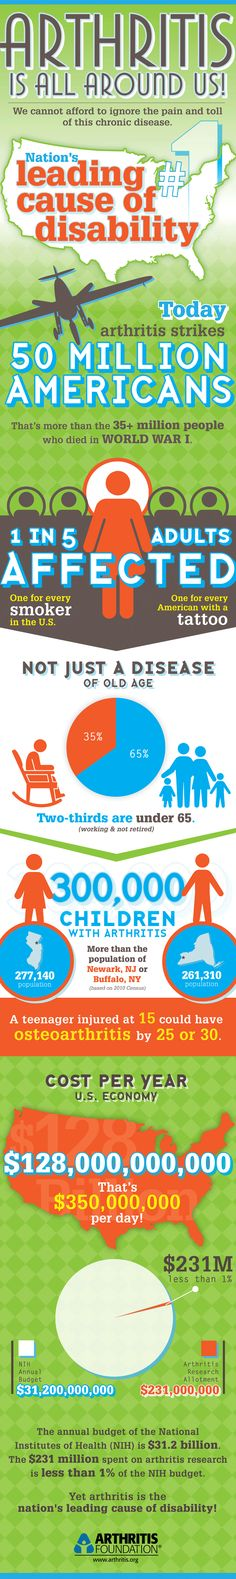 Arthritis Is All Around Us